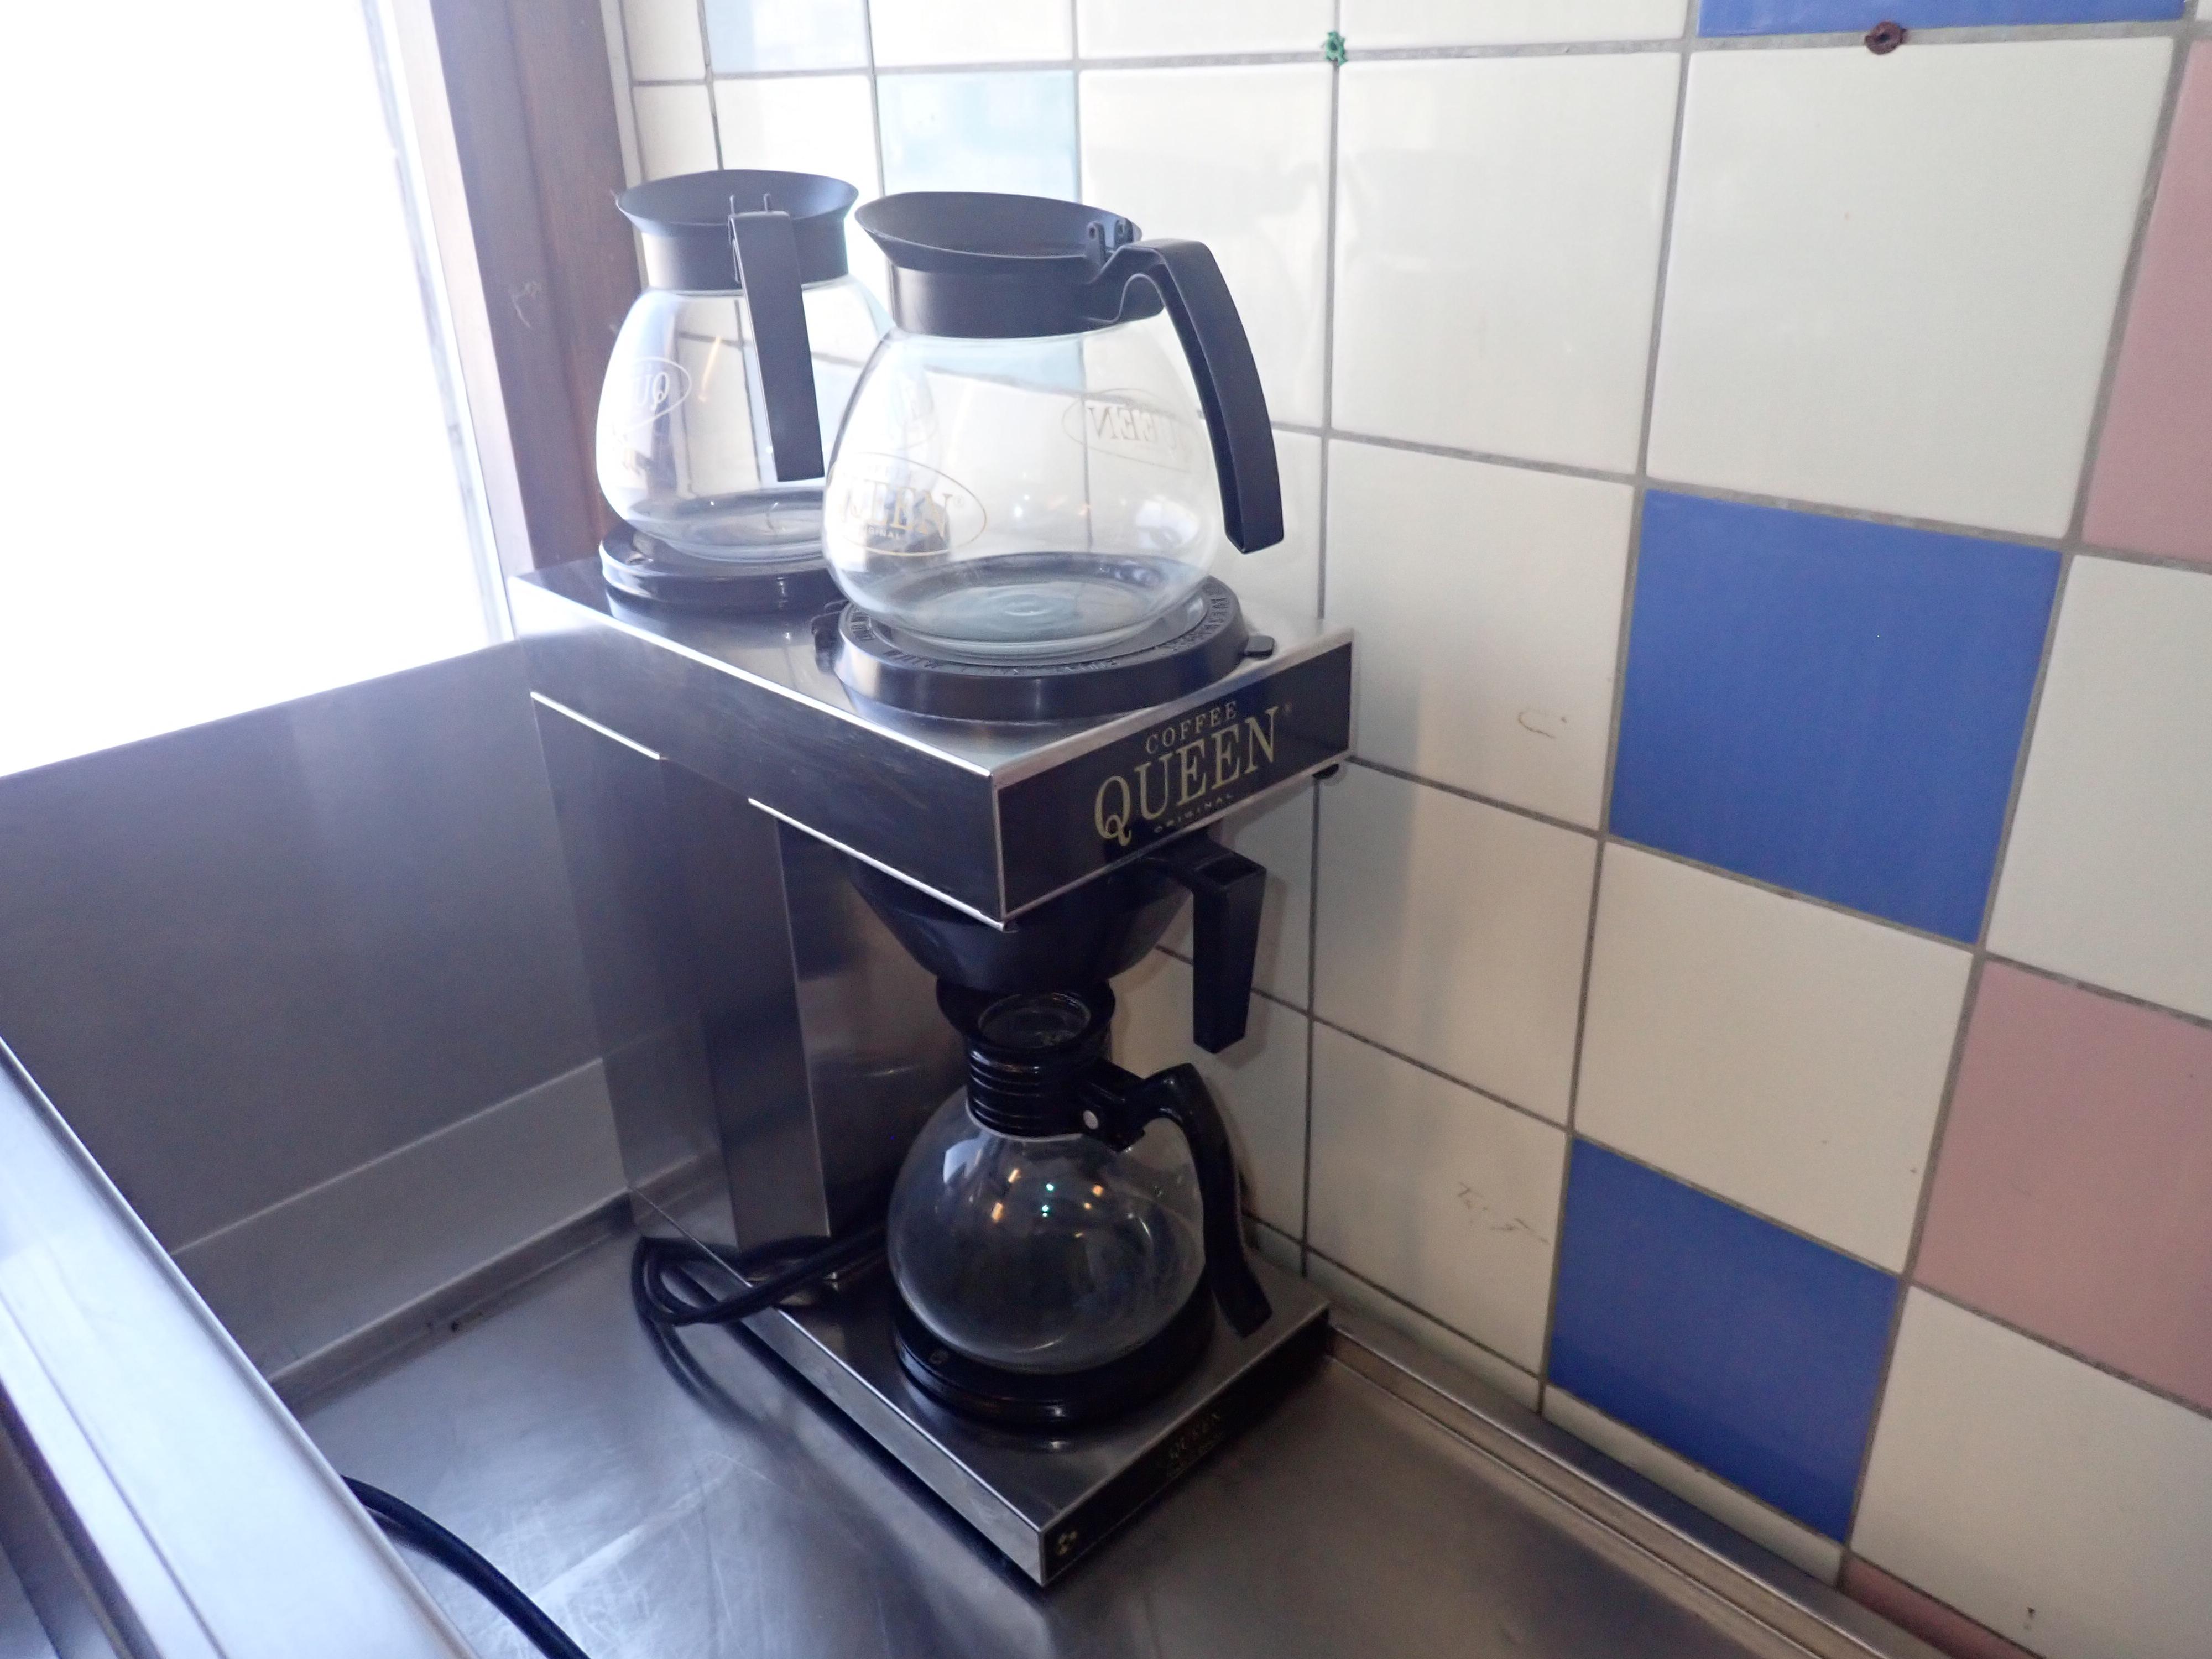 Dubbel kaffebryggare Coffee queen Nätauktioner